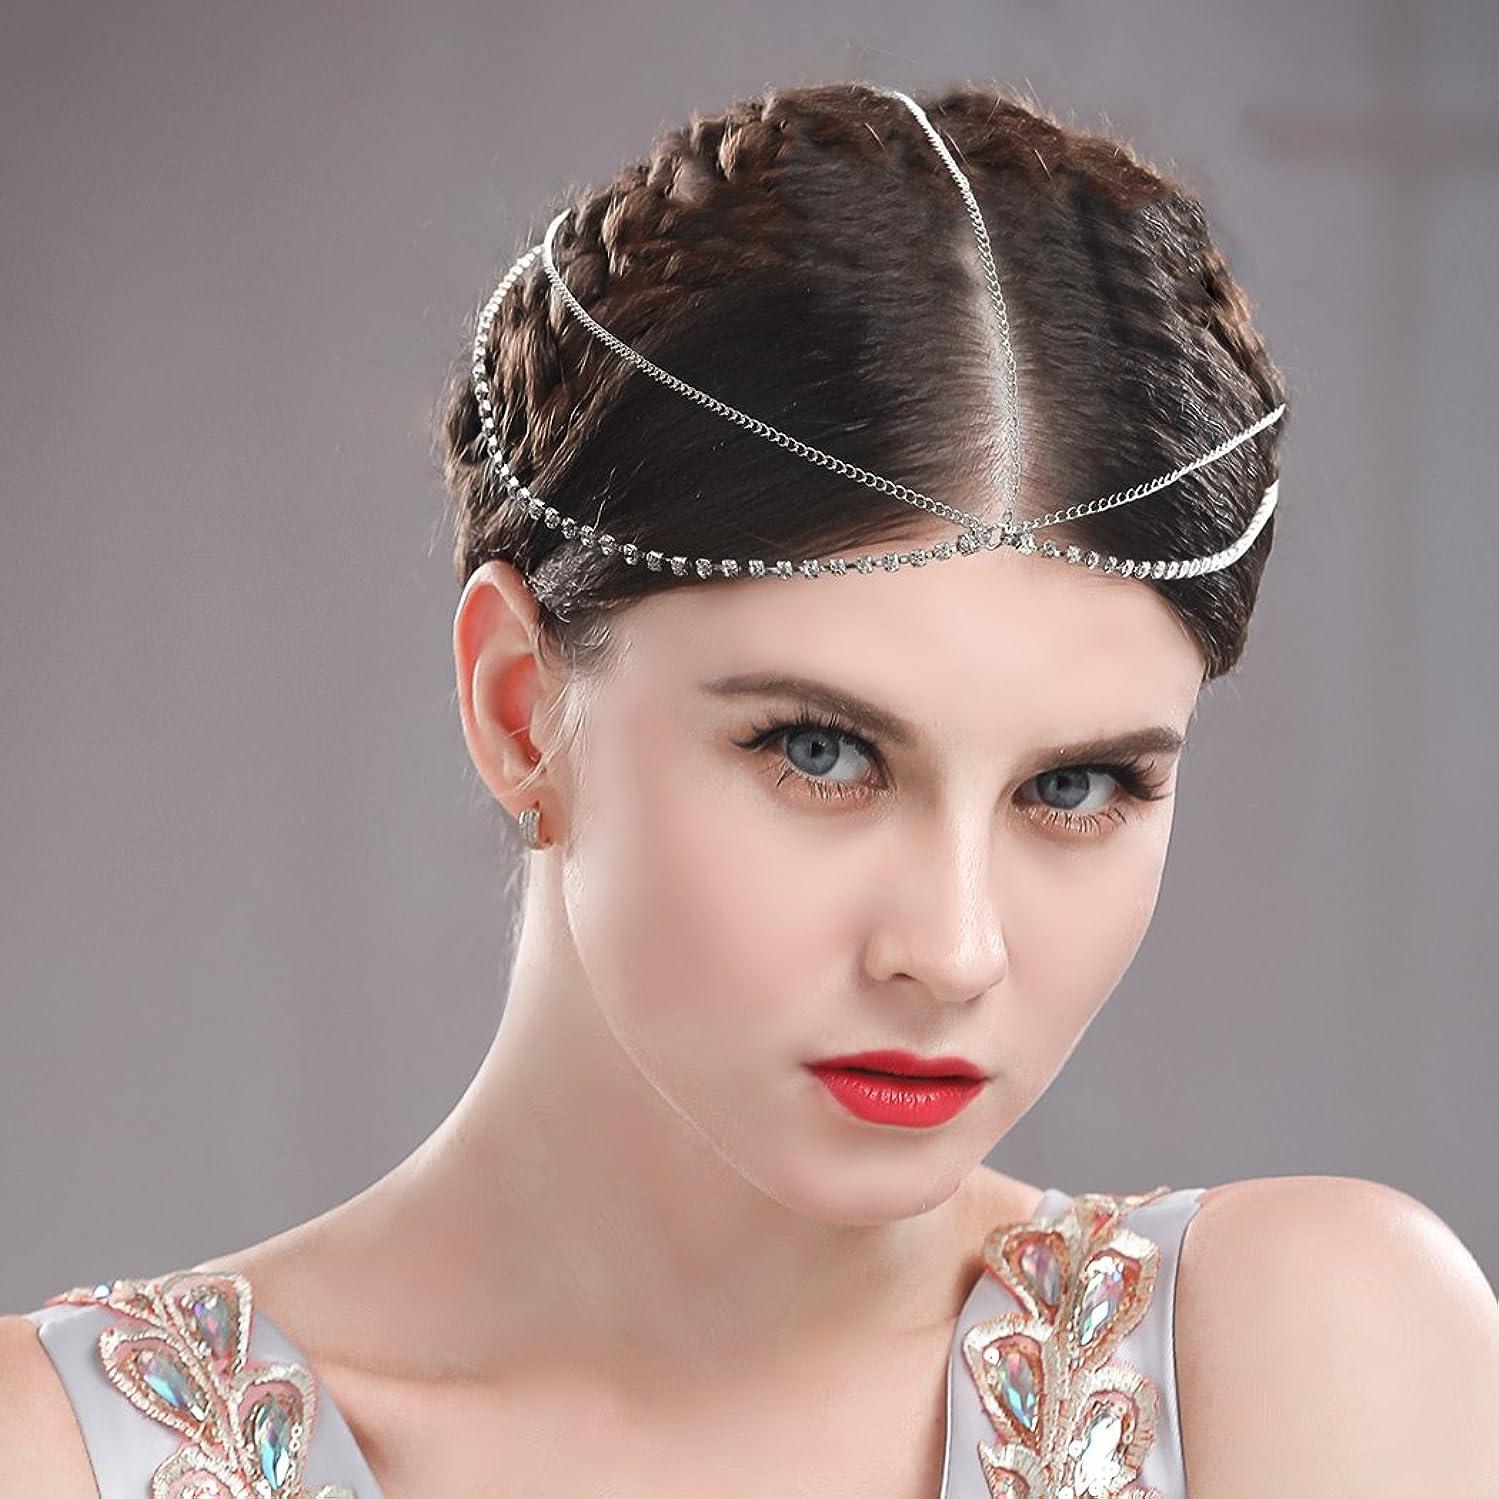 Edary Boho Headband, Wedding Headpiece for Women and Girls (Silver)